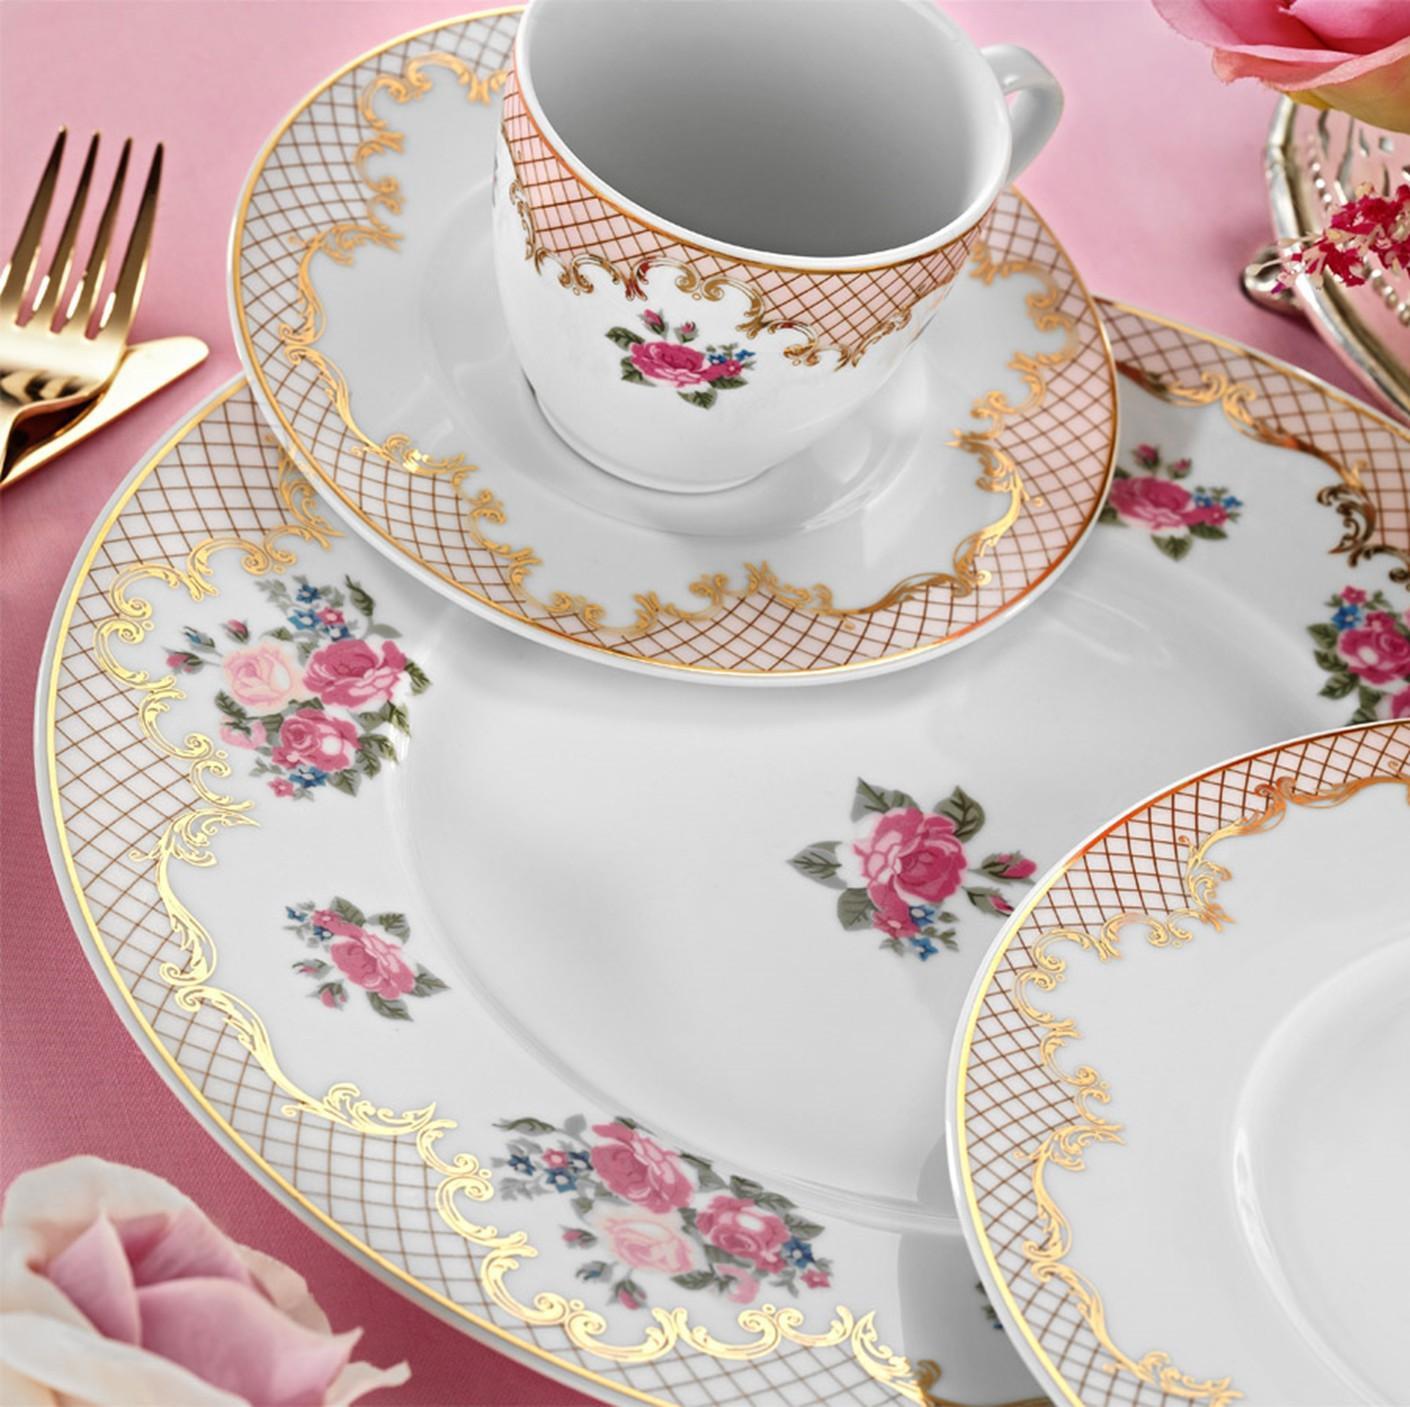 Kutahya Porselen FINE BONE Patterned 82 Pieces 8657 Dinnerware Set